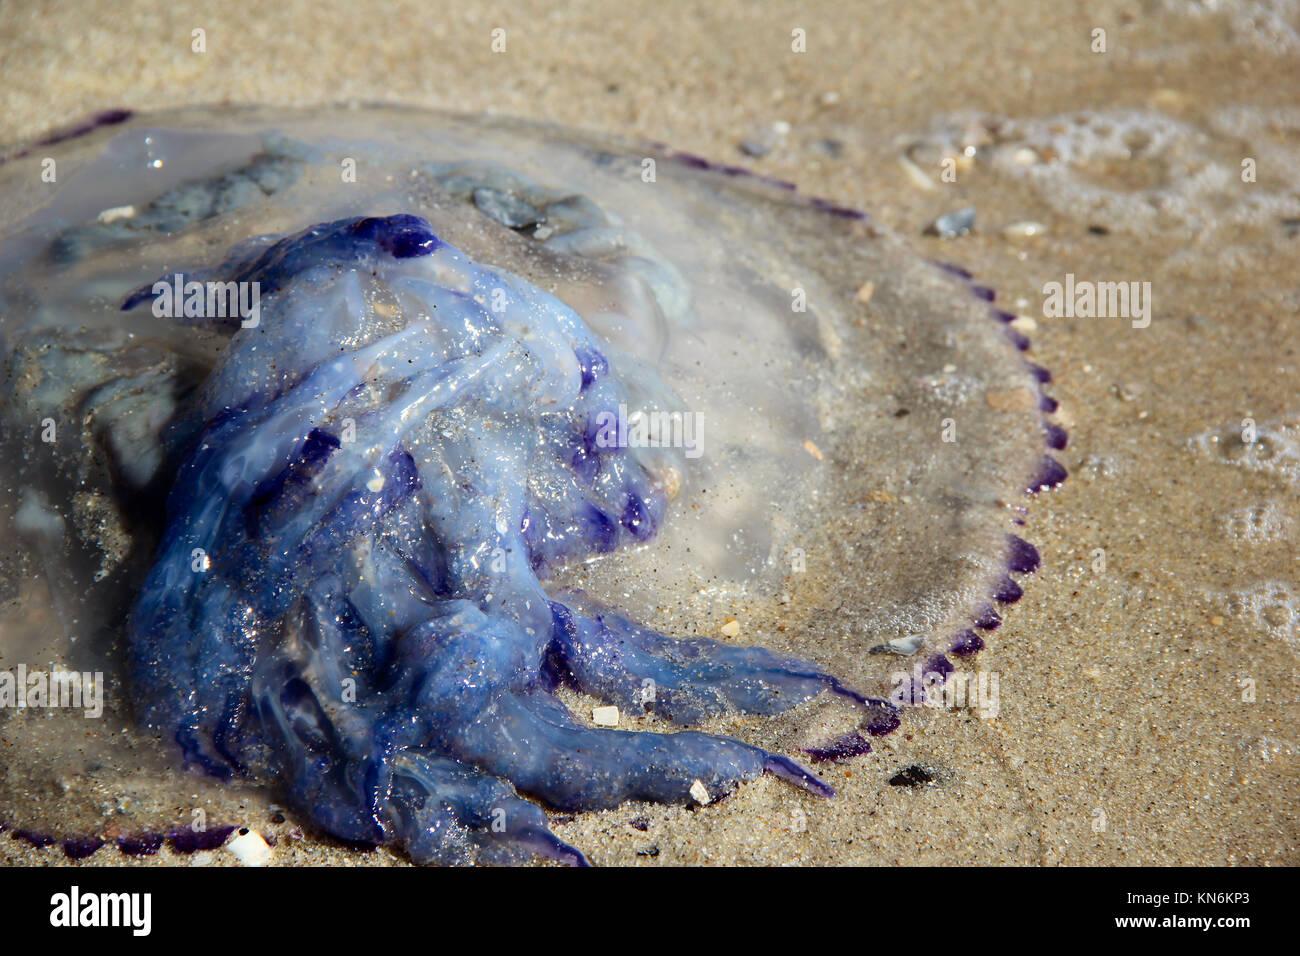 jellyfish on the beach. photo - Stock Image